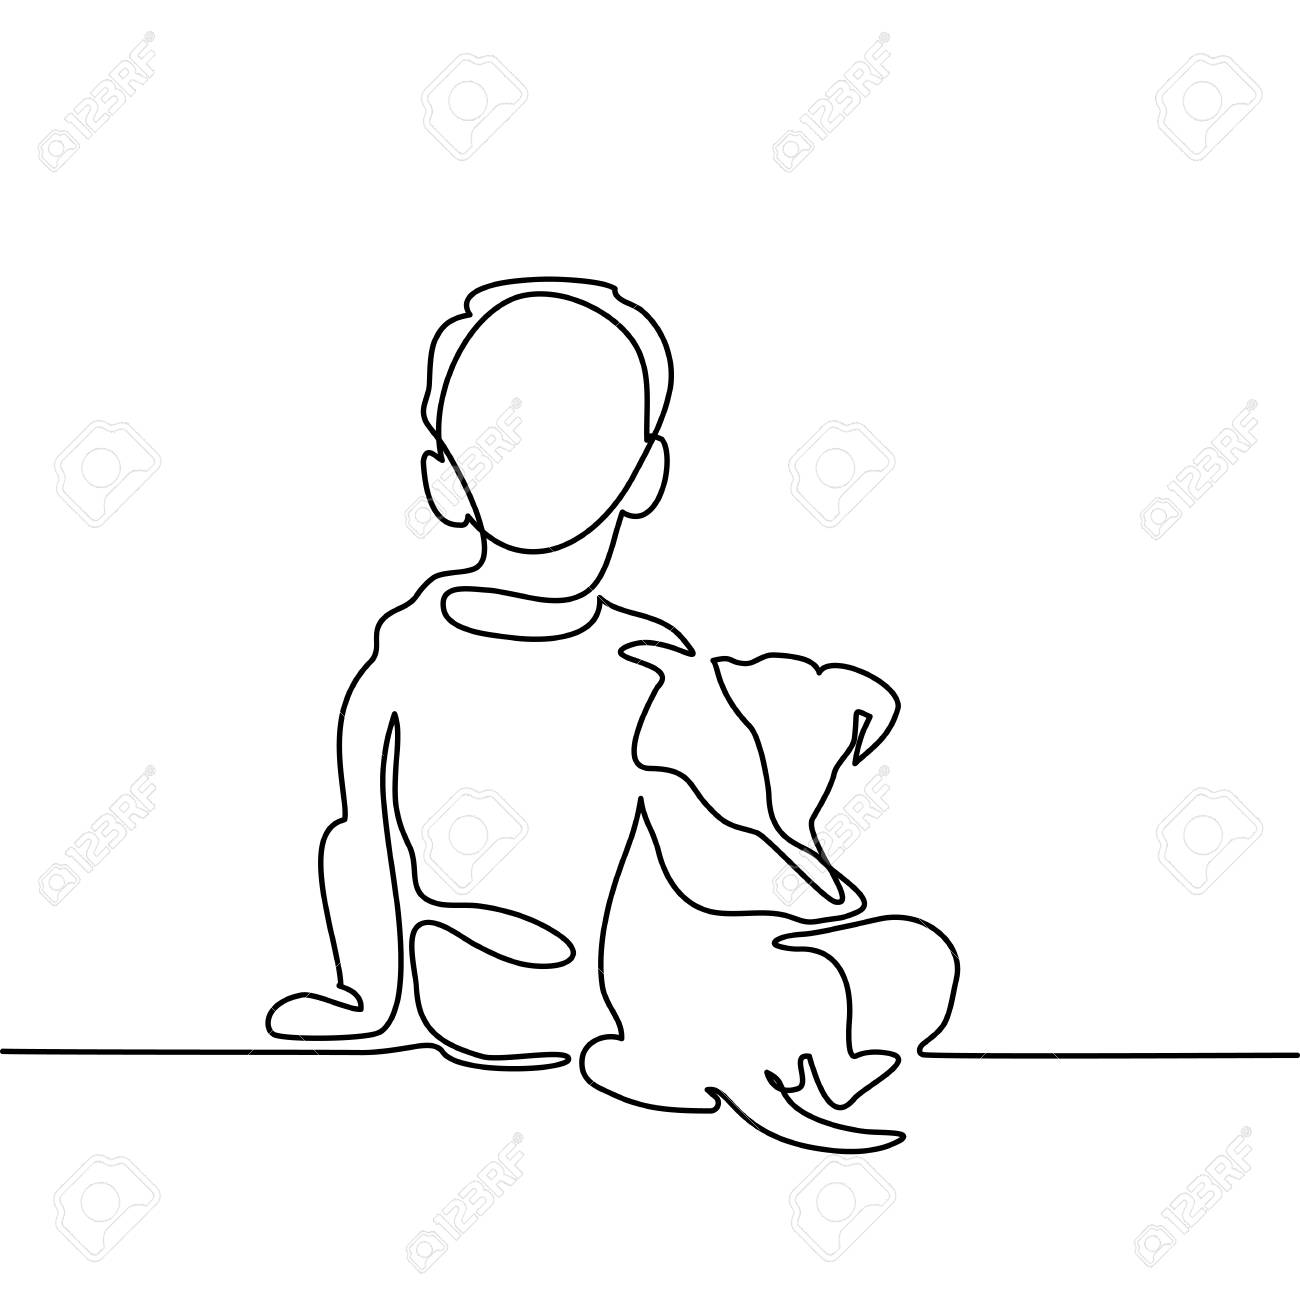 Boy hug dog. Continuous line drawing. Vector illustration - 83804638